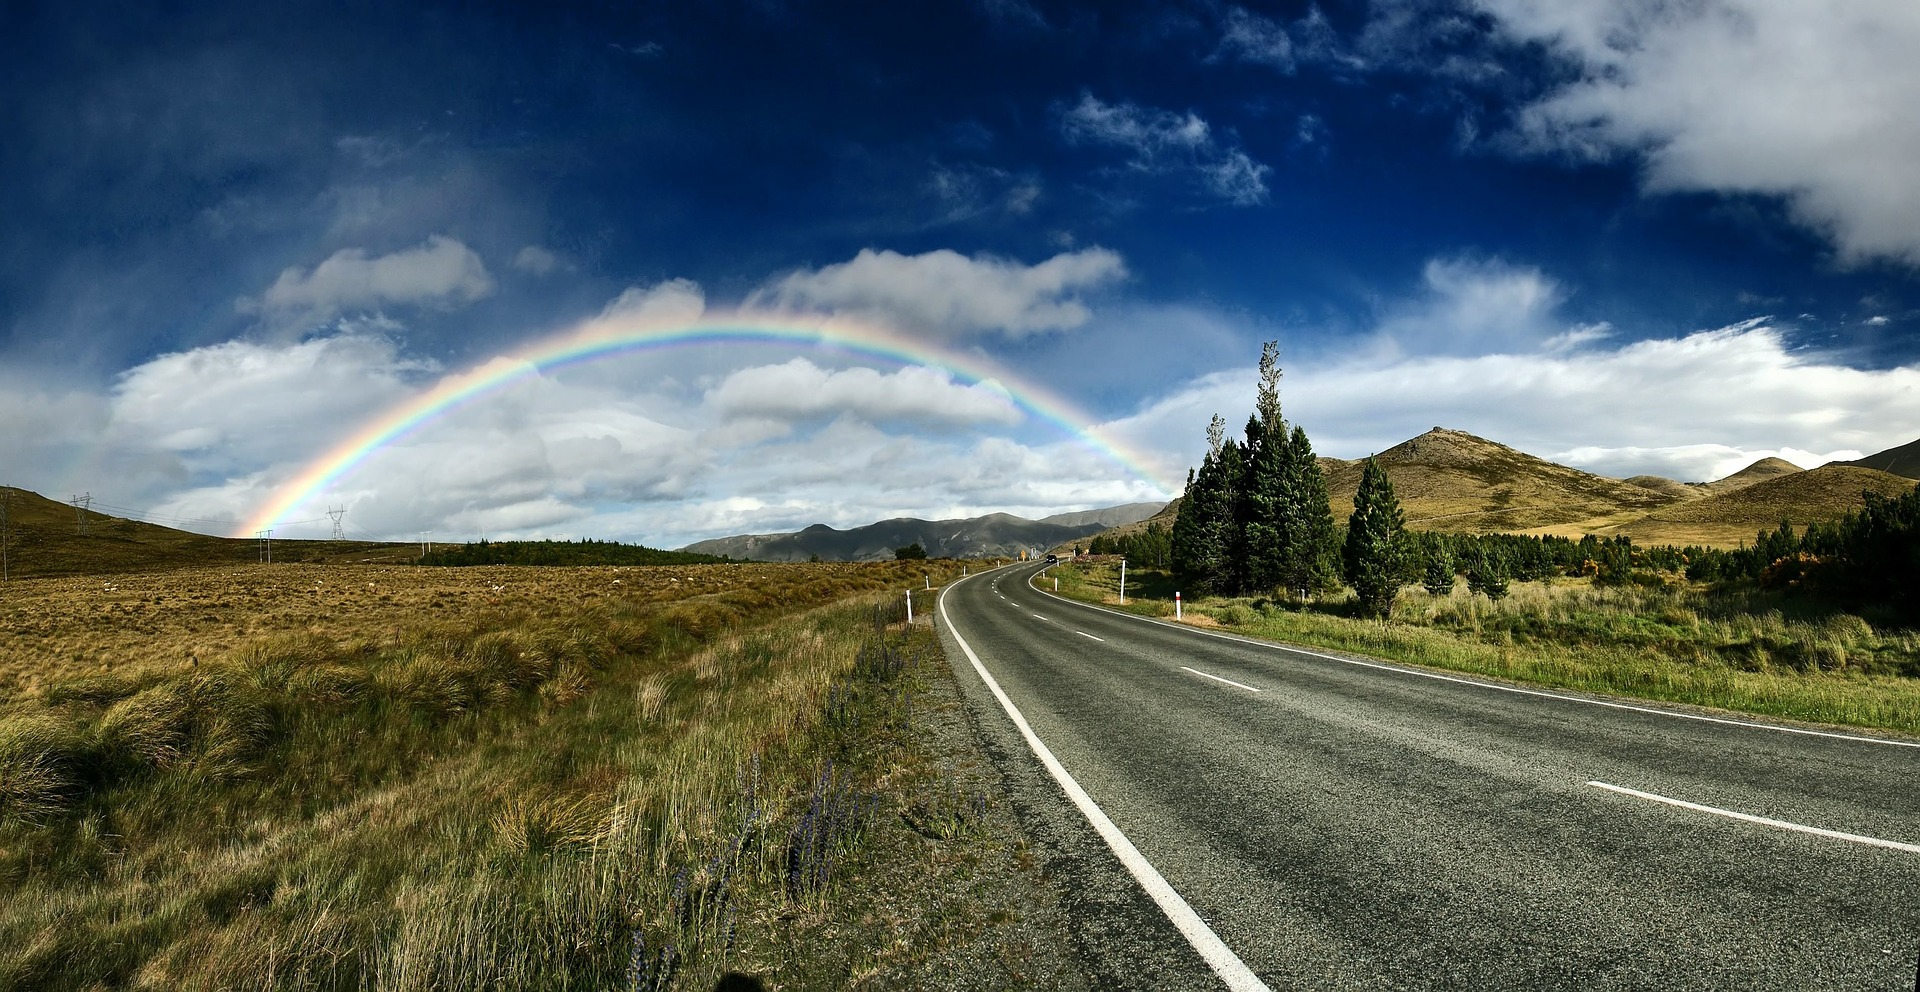 rainbow-background-1149610_1920